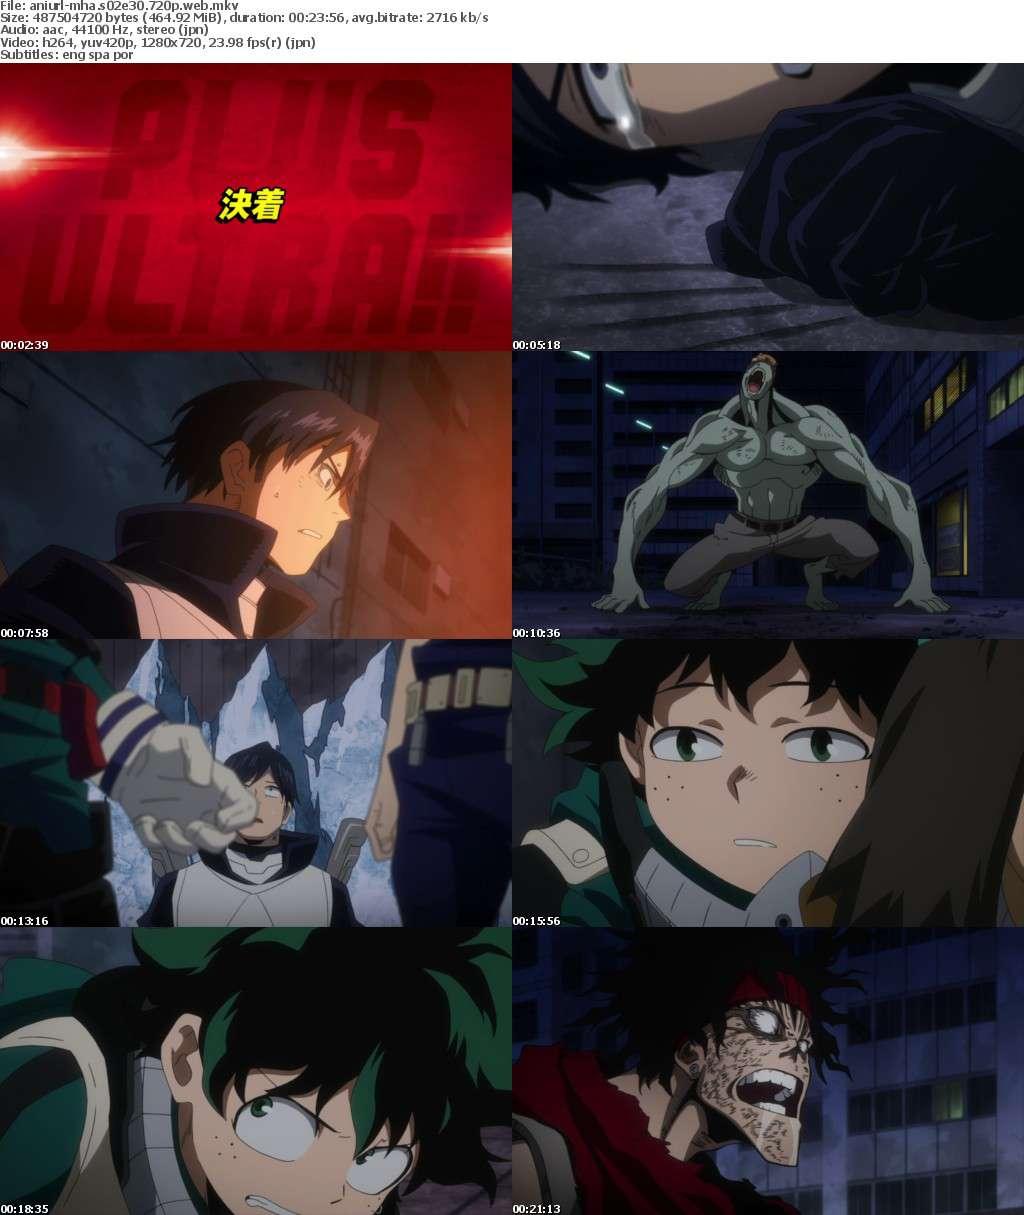 My Hero Academia S02E30 720p WEB x264-ANiURL